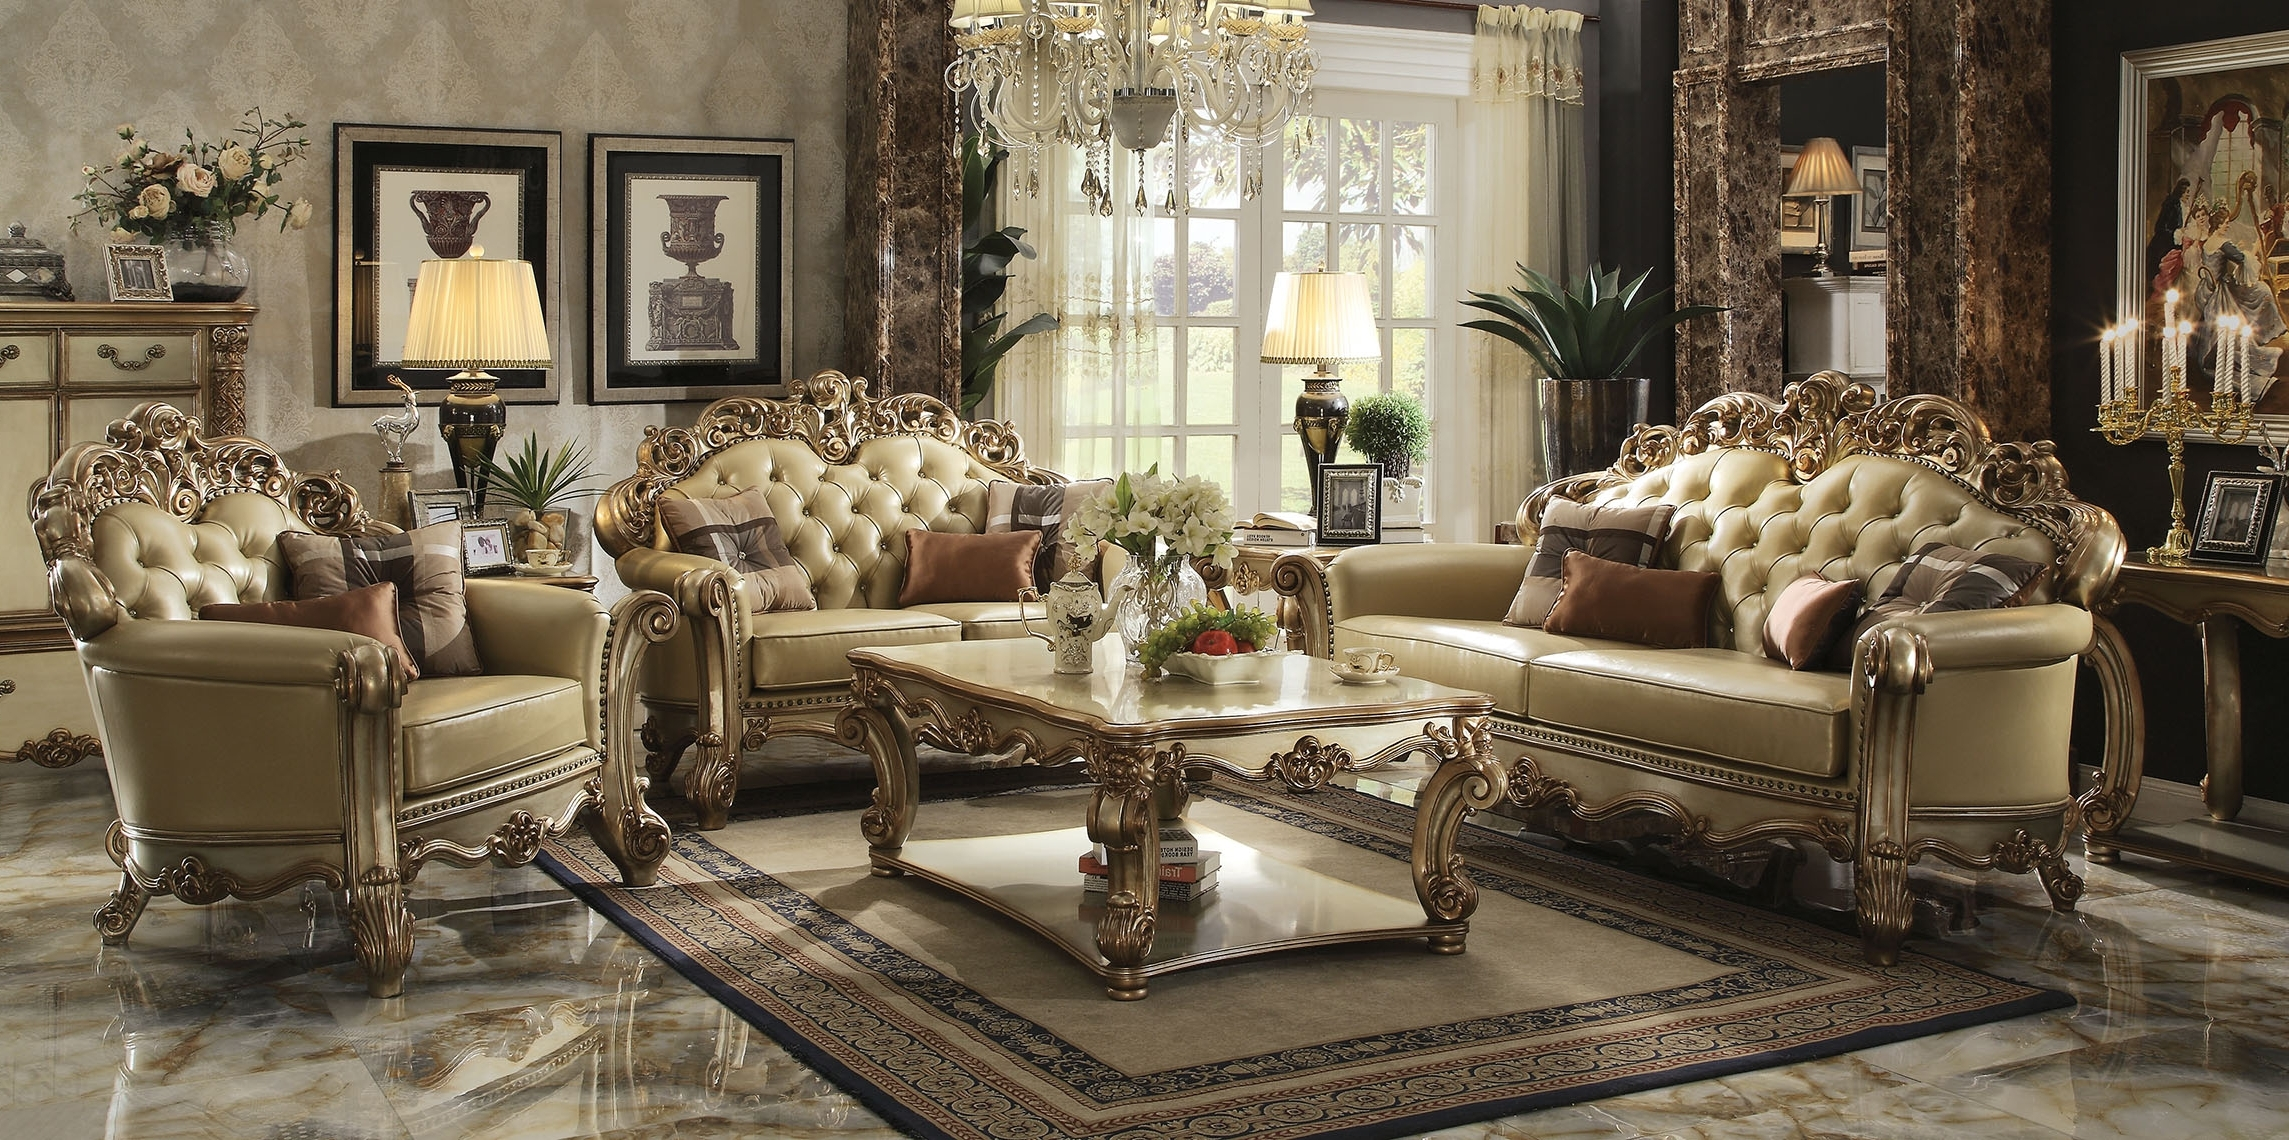 Most Recent Classic Sofa Set (View 9 of 15)